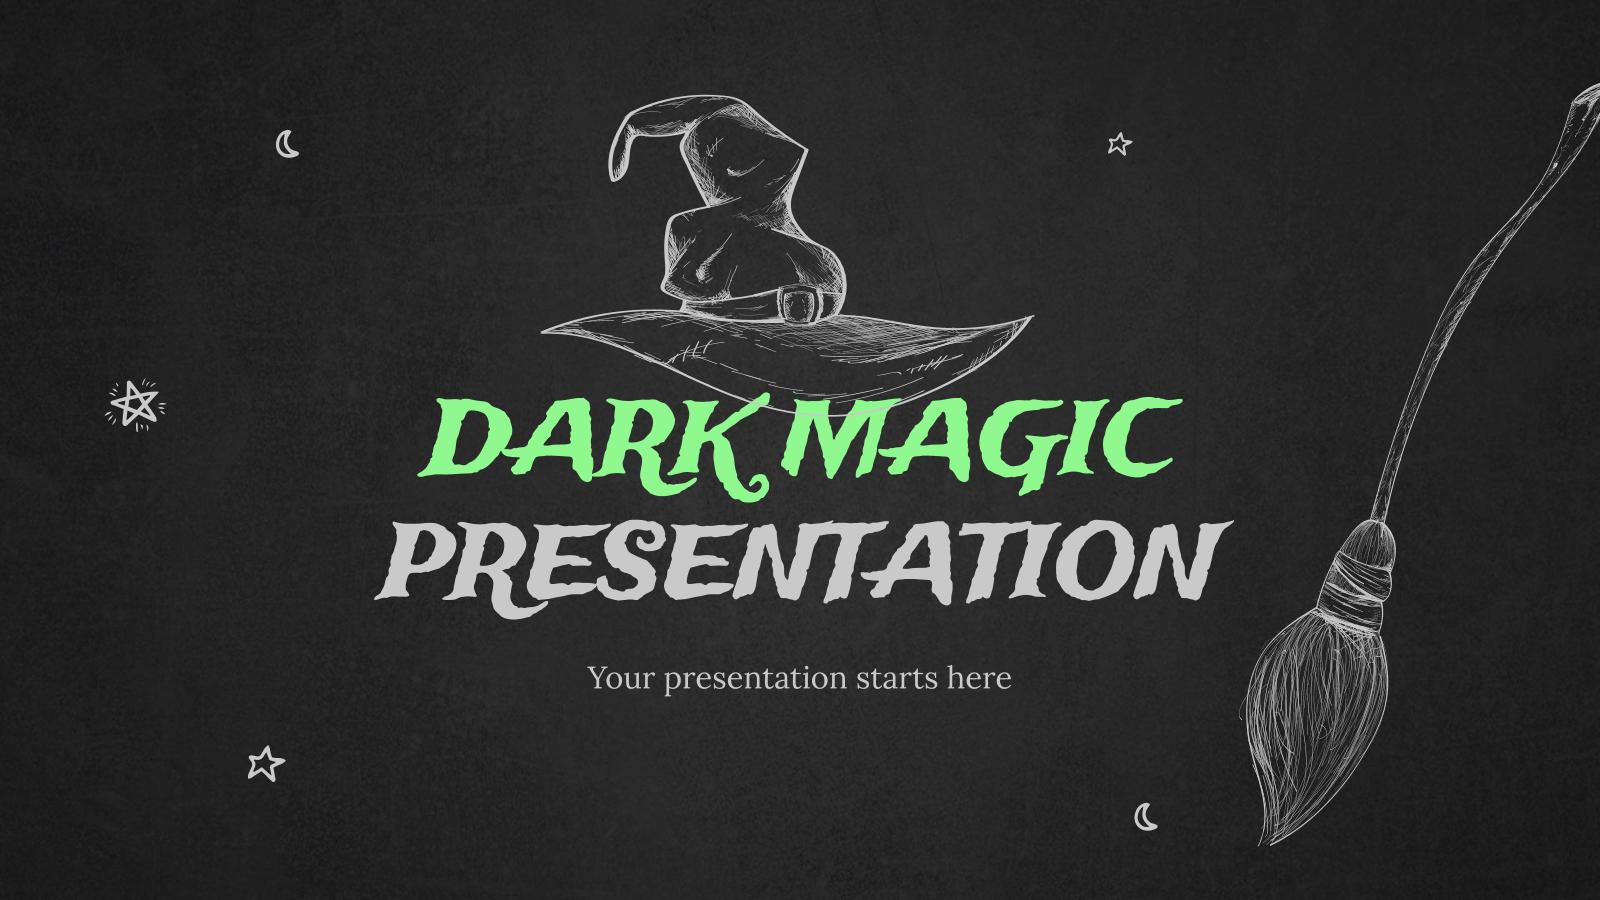 Dark Magic presentation template